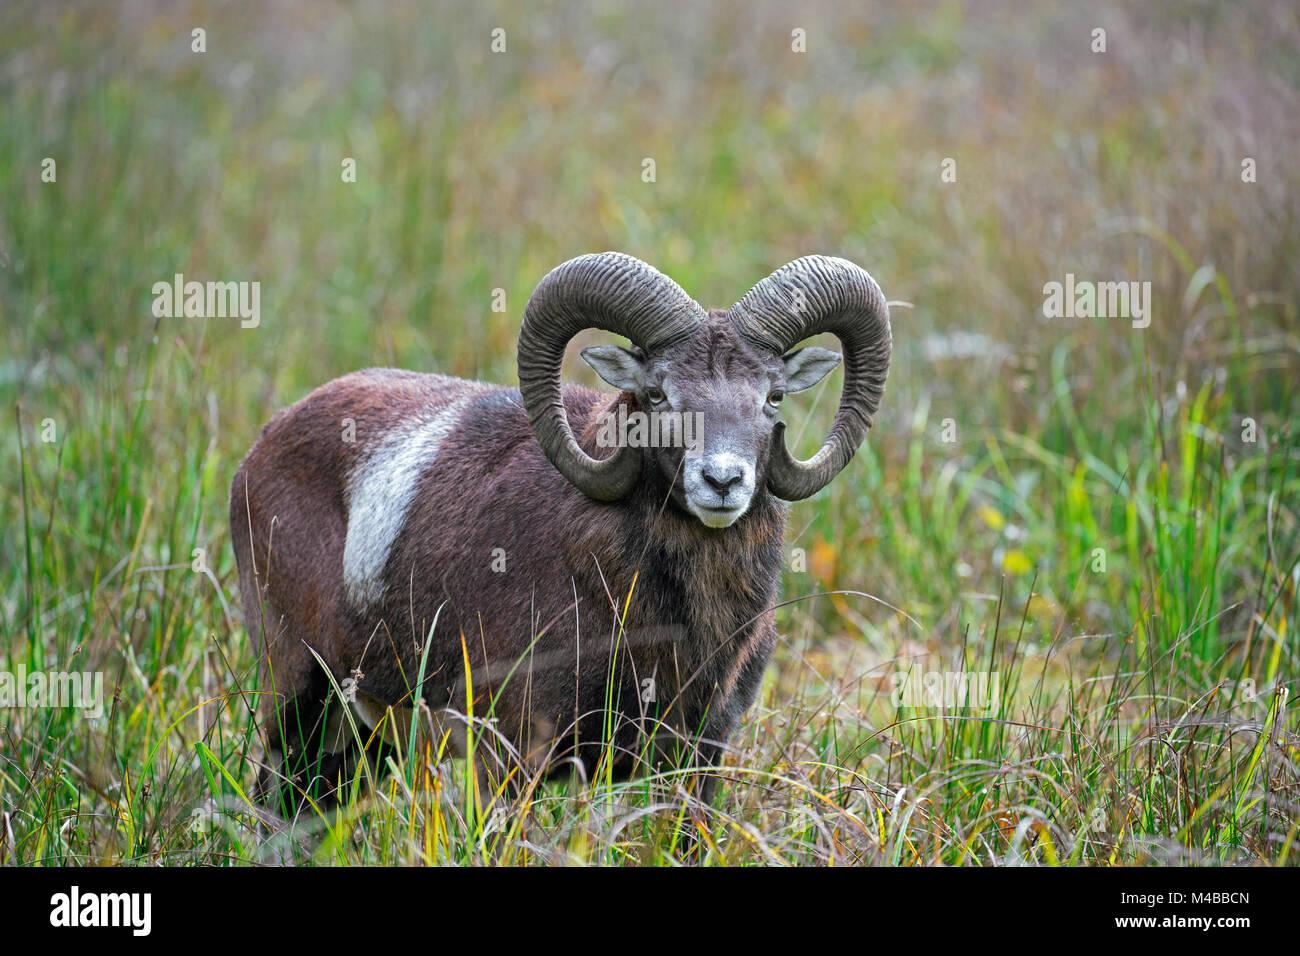 Mouflon (Ovis gmelini européenne / Ovis ammon musimon / Ovis orientalis musimon) ram avec grandes cornes dans Photo Stock